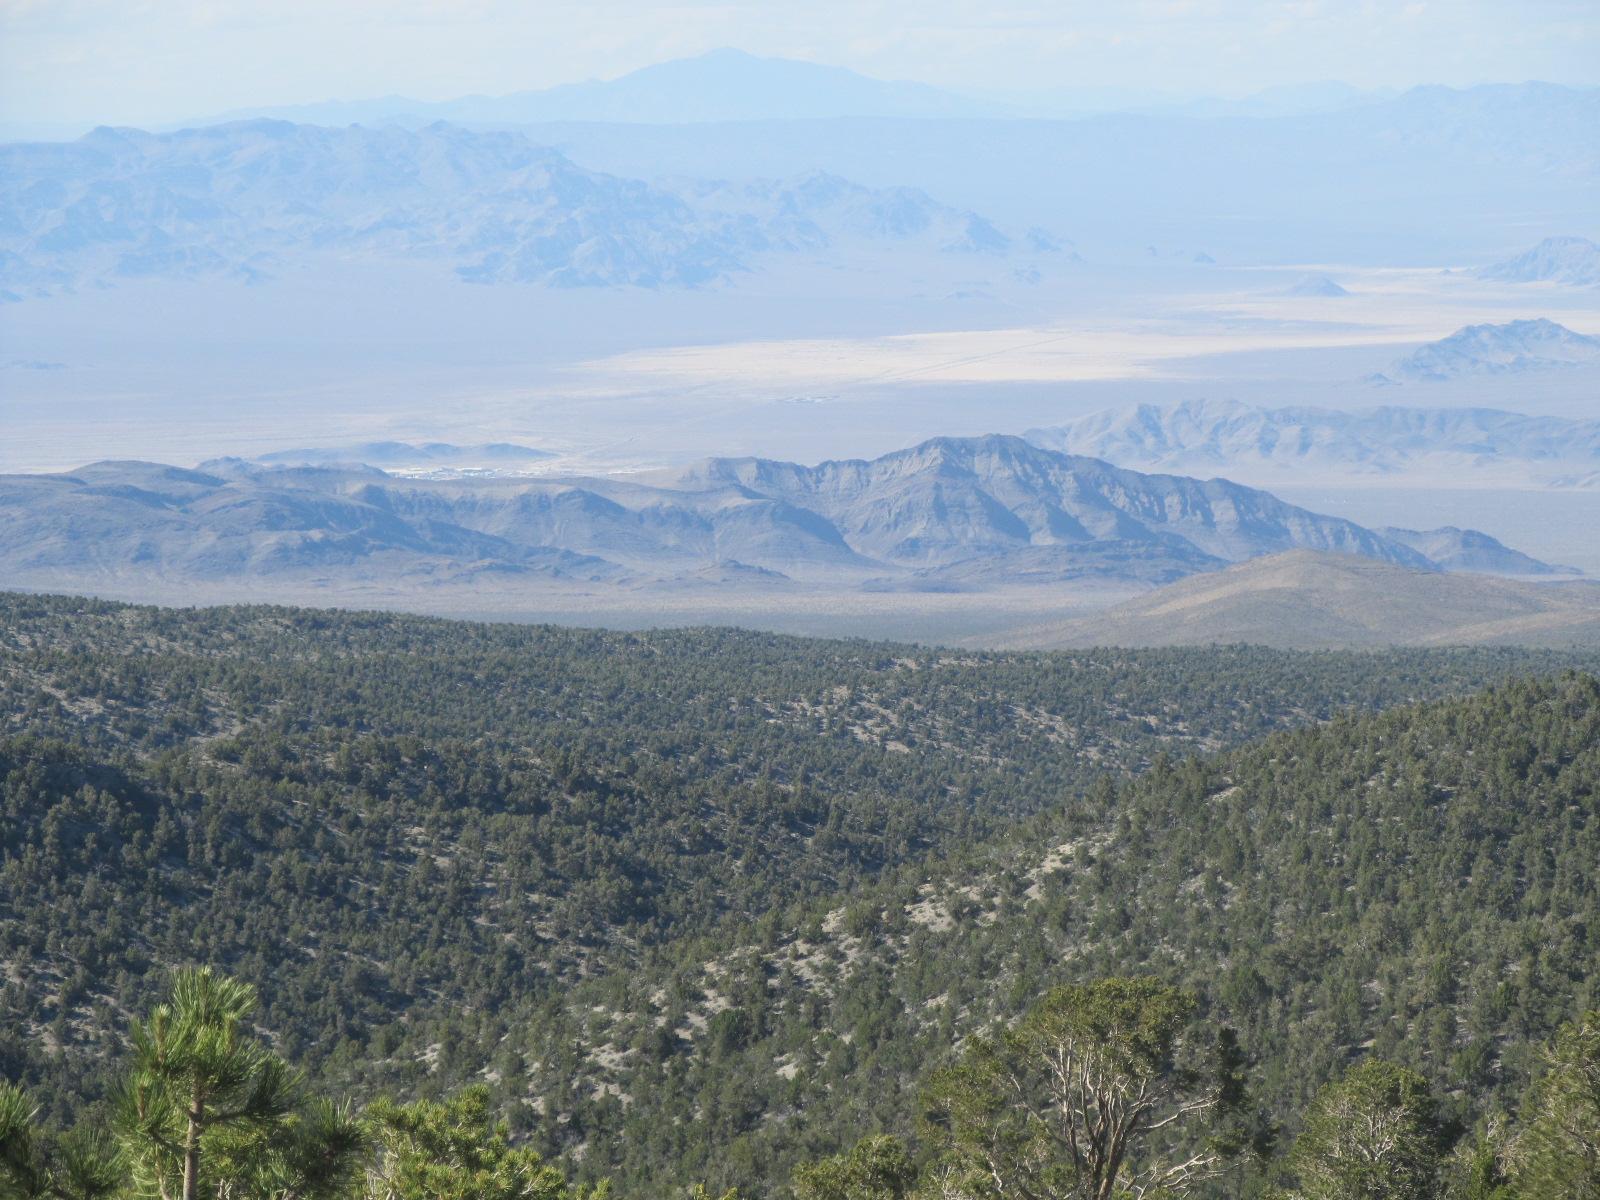 Climbing Lee Canyon Bike Climb (Hwy 156) by bike - view of desert and plains below - hwy 95